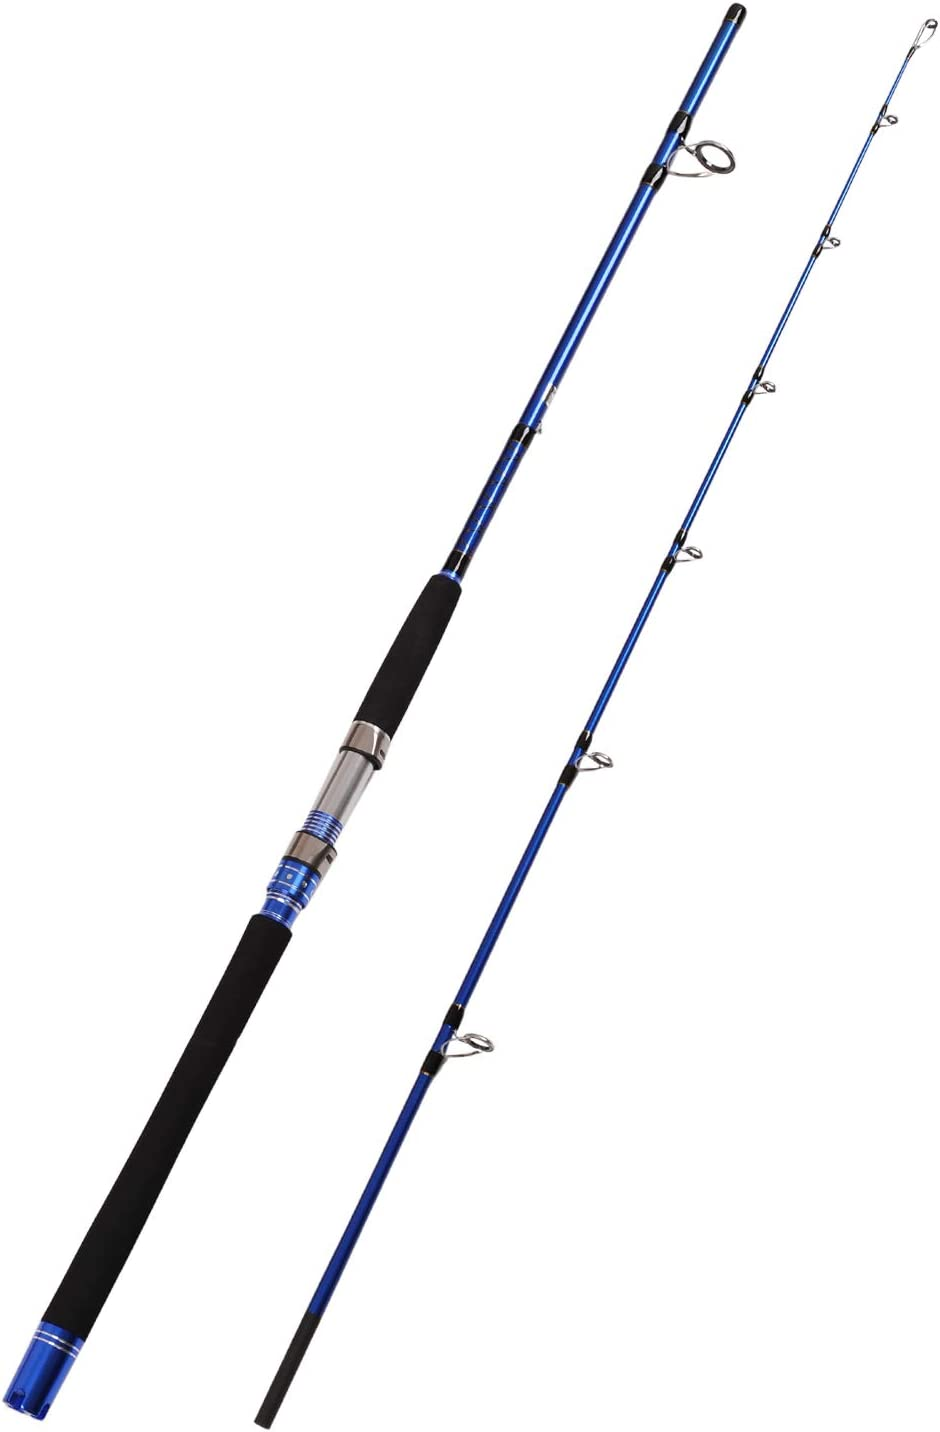 Fiblink 2-Piece Spinning Fishing Rod